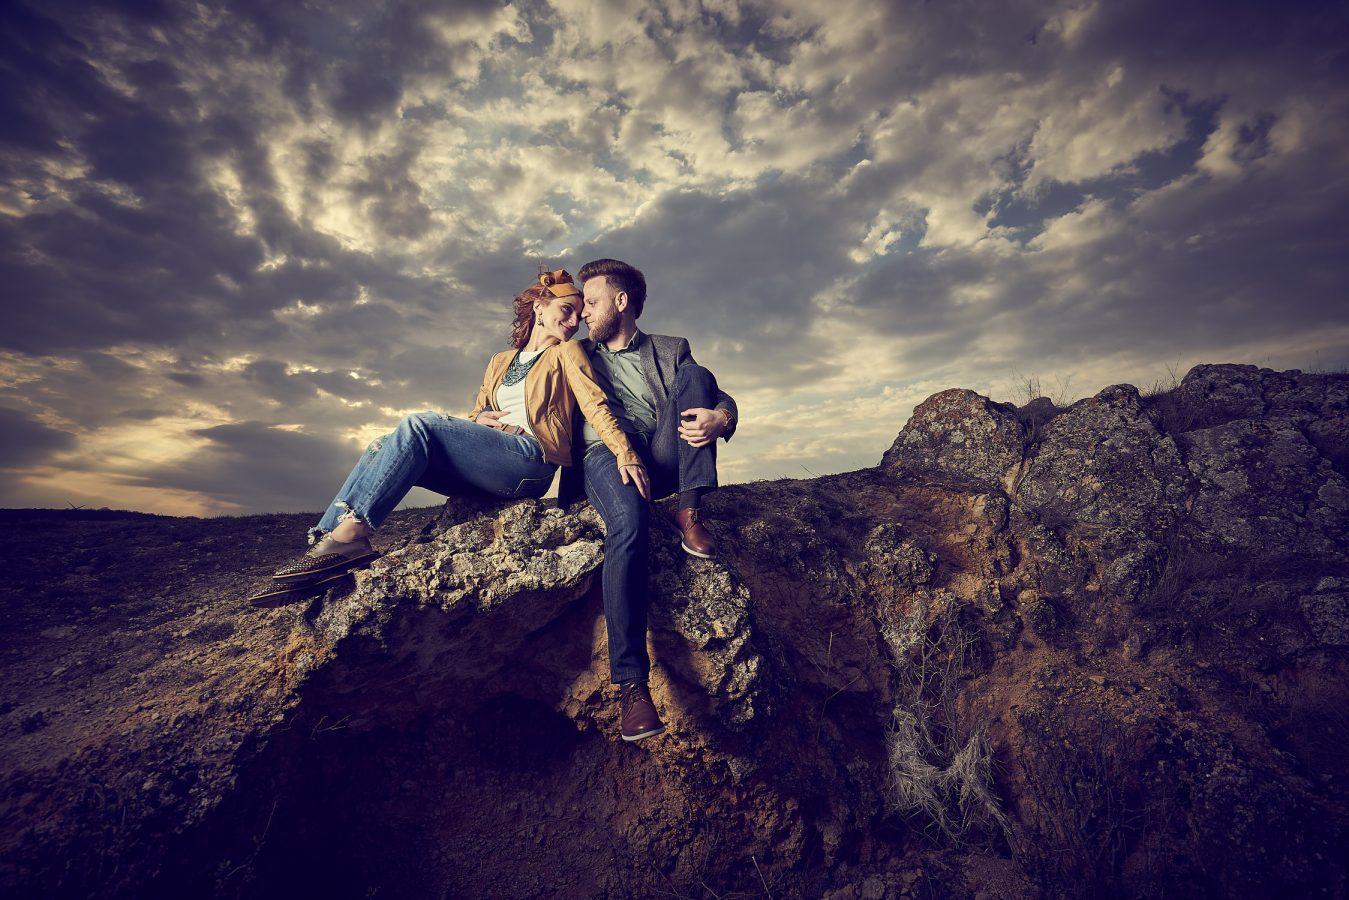 Couples Photography by Alin Popescu - Jönköping couples photographer